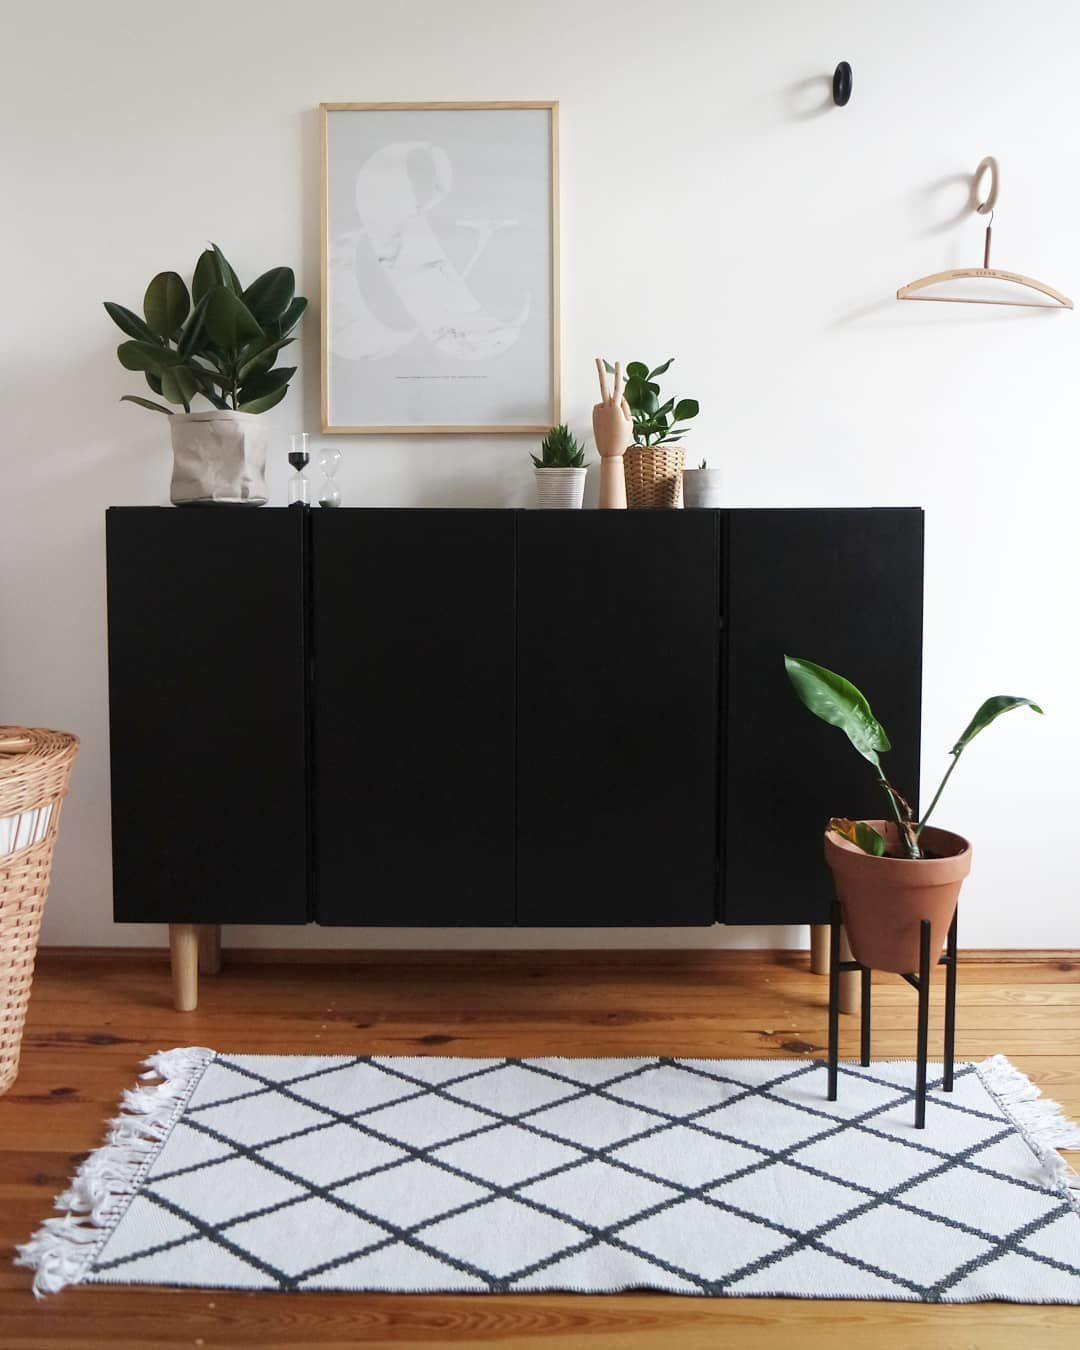 do it yourself ideen f r dein zuhause seite 91. Black Bedroom Furniture Sets. Home Design Ideas